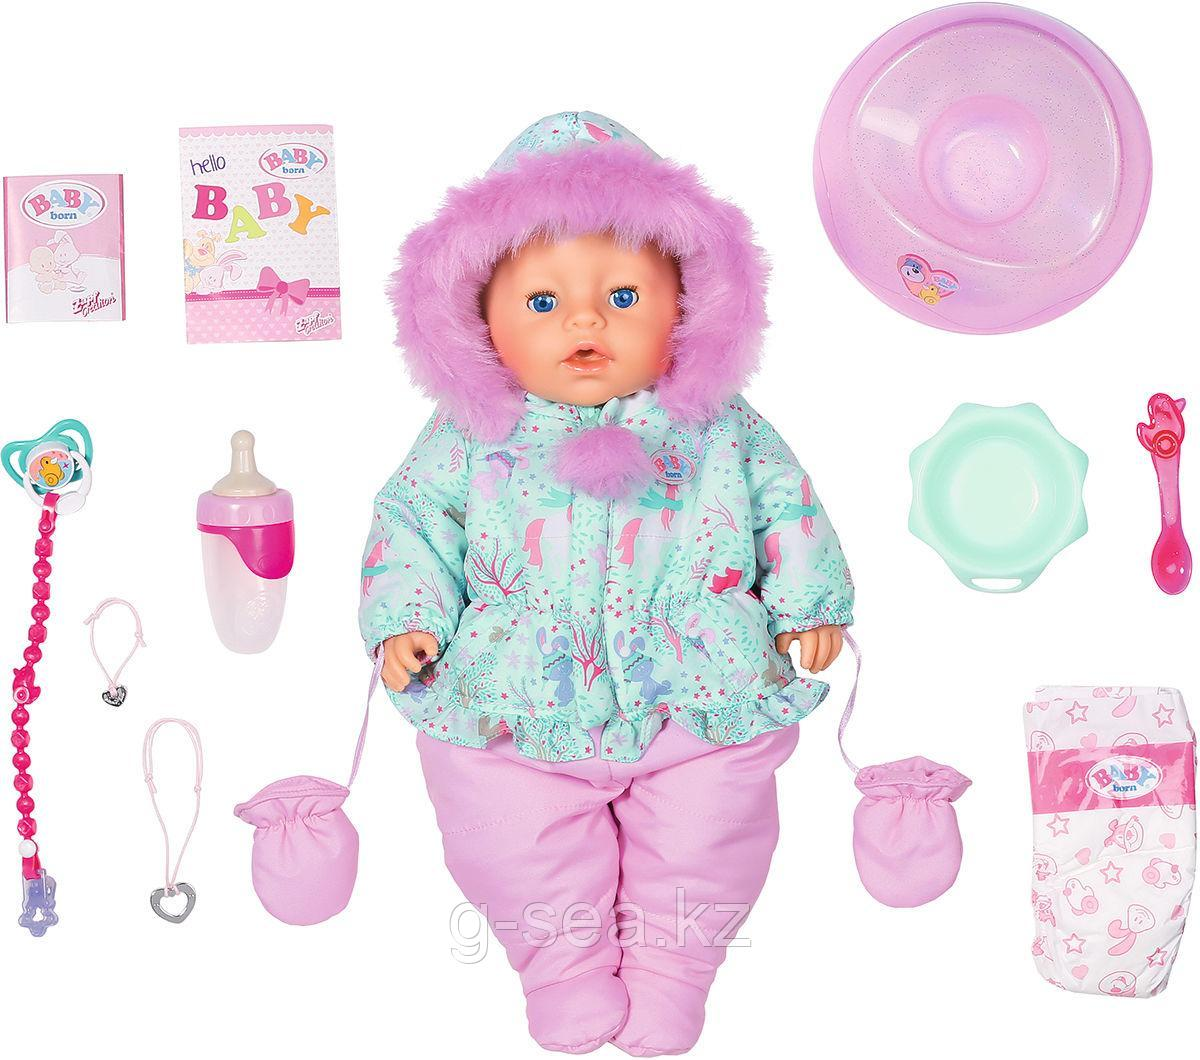 BABY born: Кукла Интерактивная Зимняя, 43 см, кор.